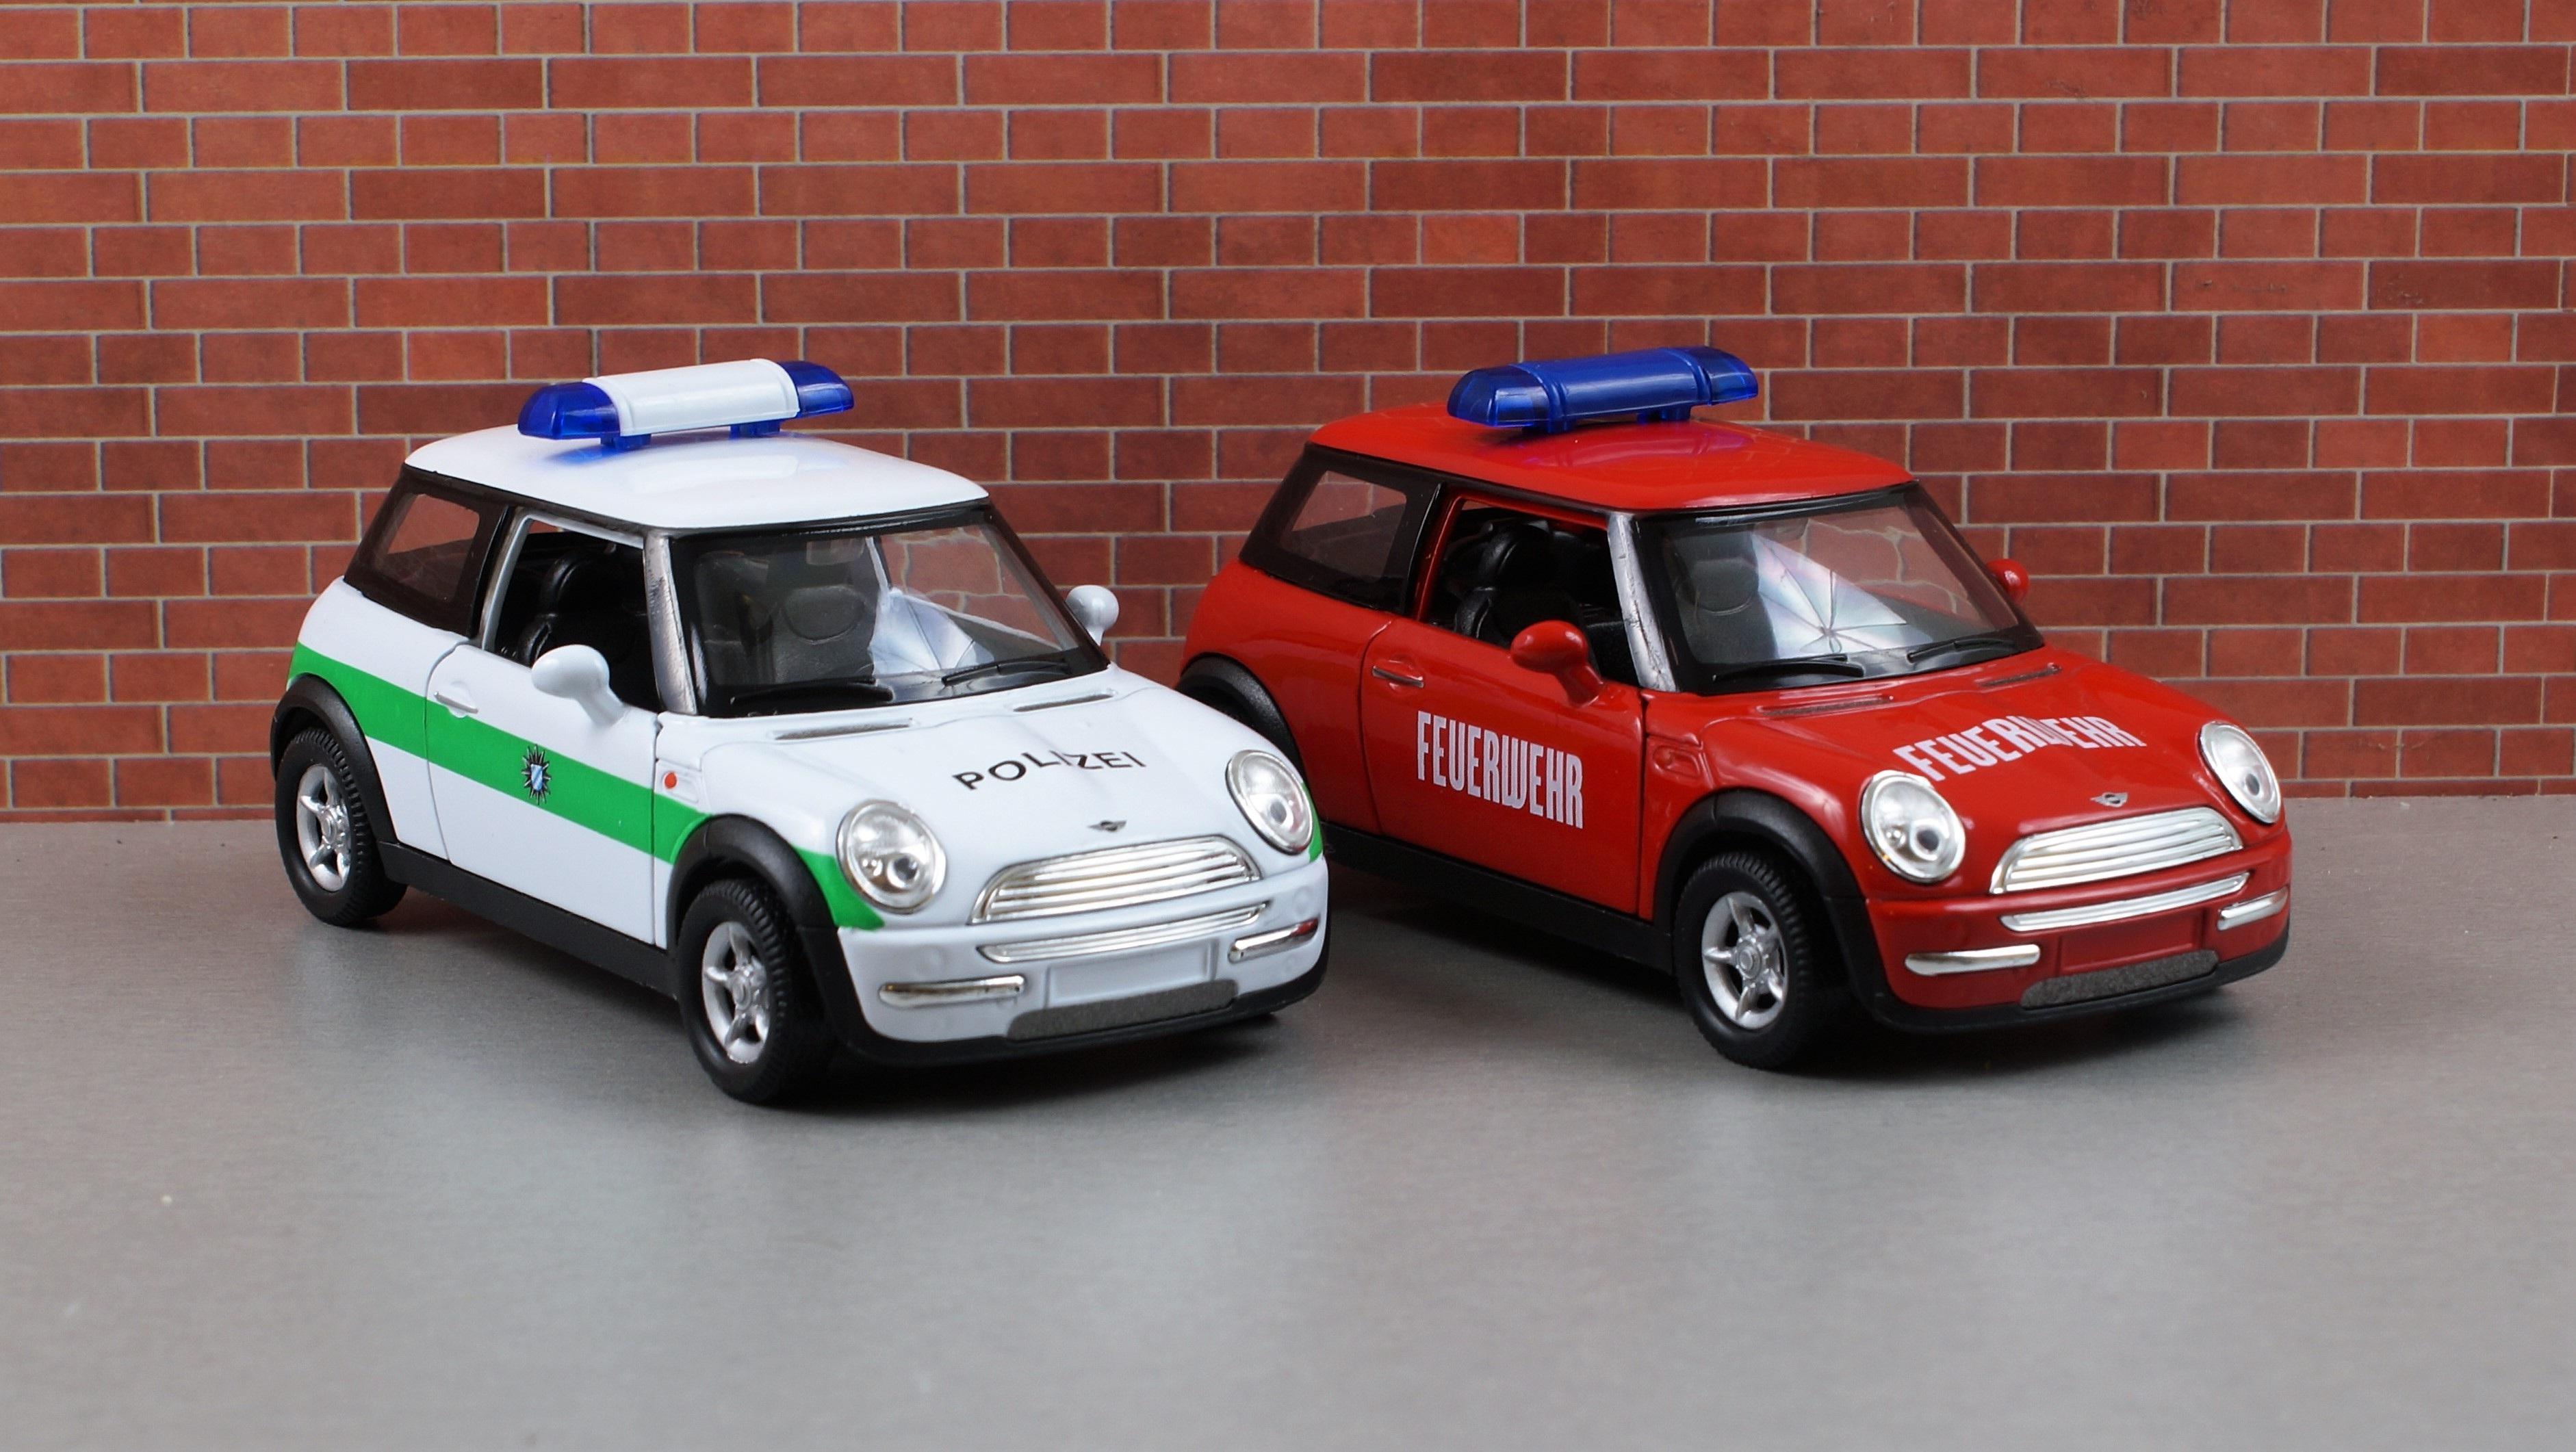 Free images auto fire truck motor vehicle mini cooper for Motor city mini cooper